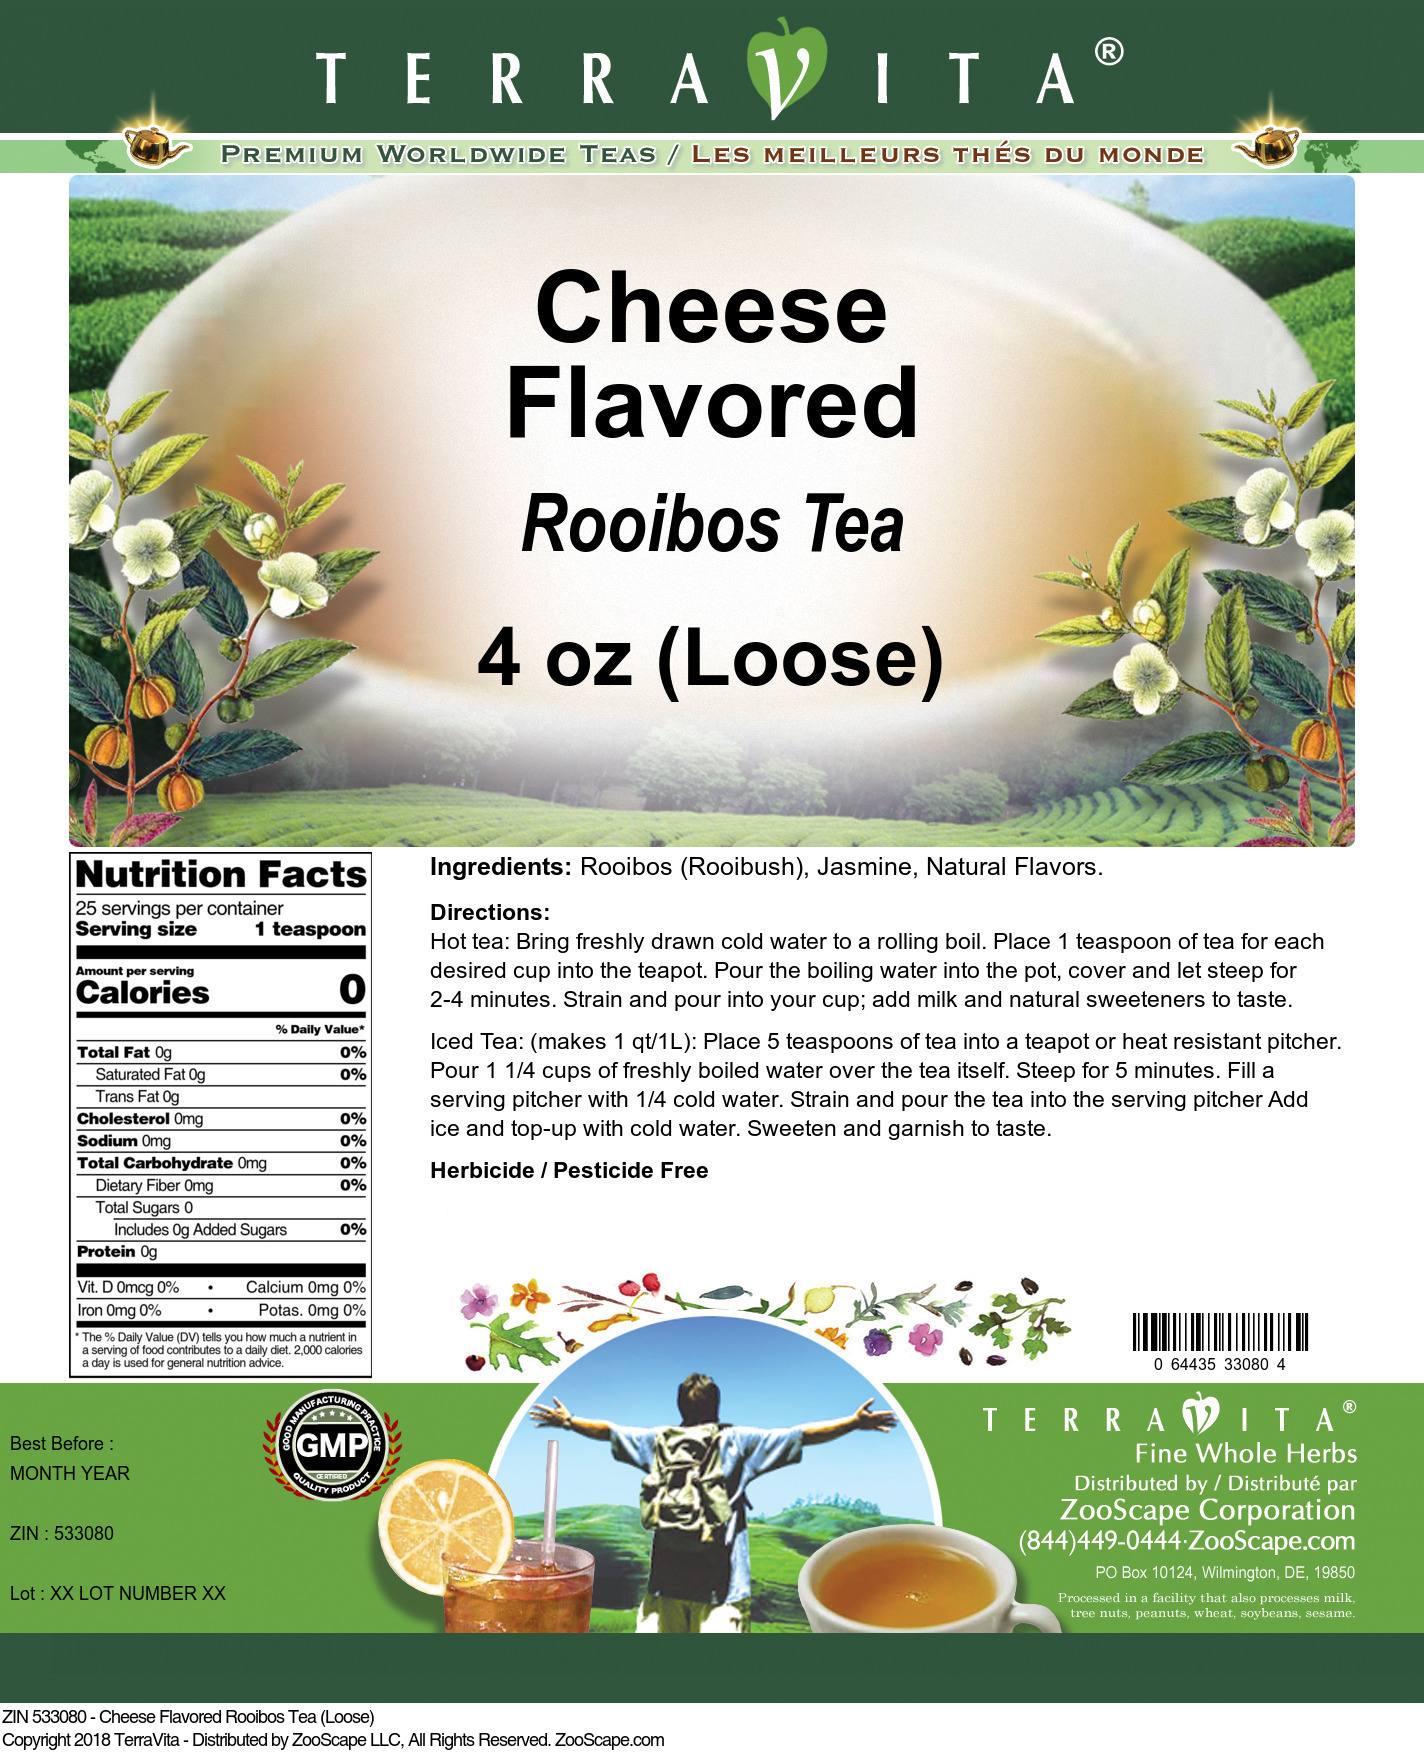 Cheese Flavored Rooibos Tea (Loose)